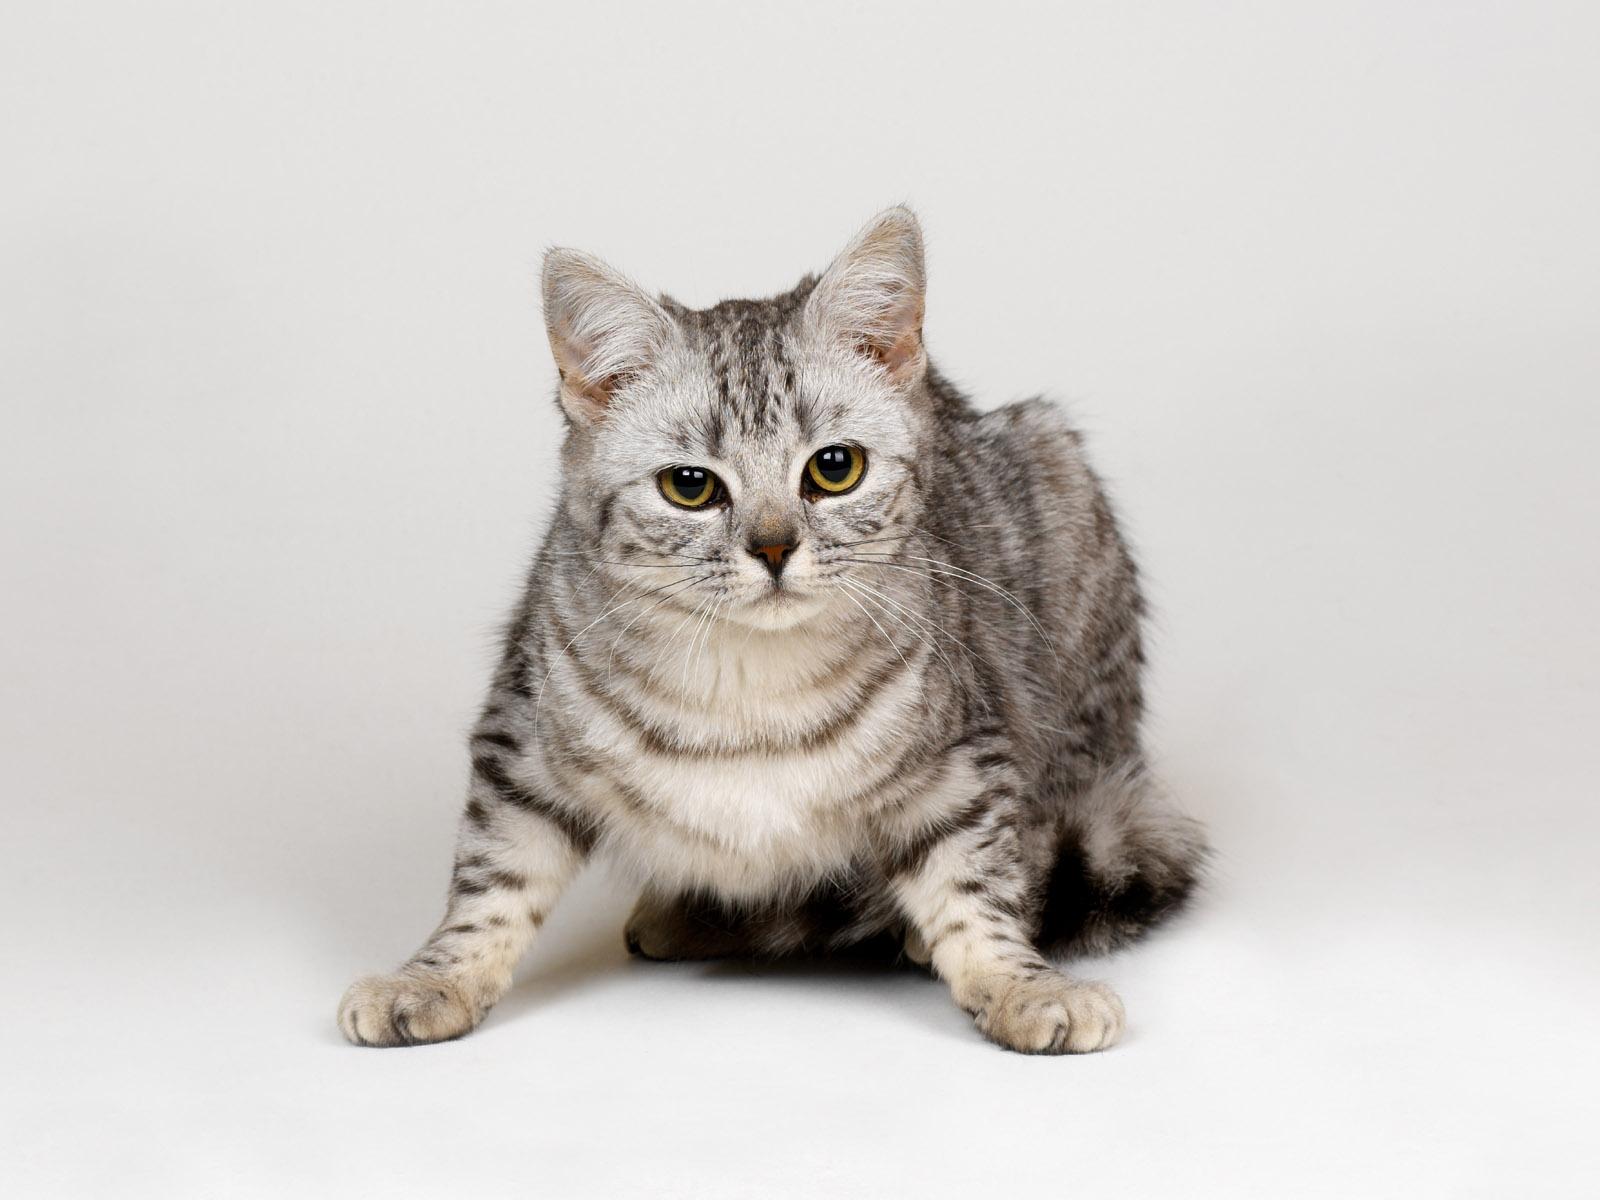 Wallpaper : Asian, grey, fur, whiskers, British shorthair, kitten ...